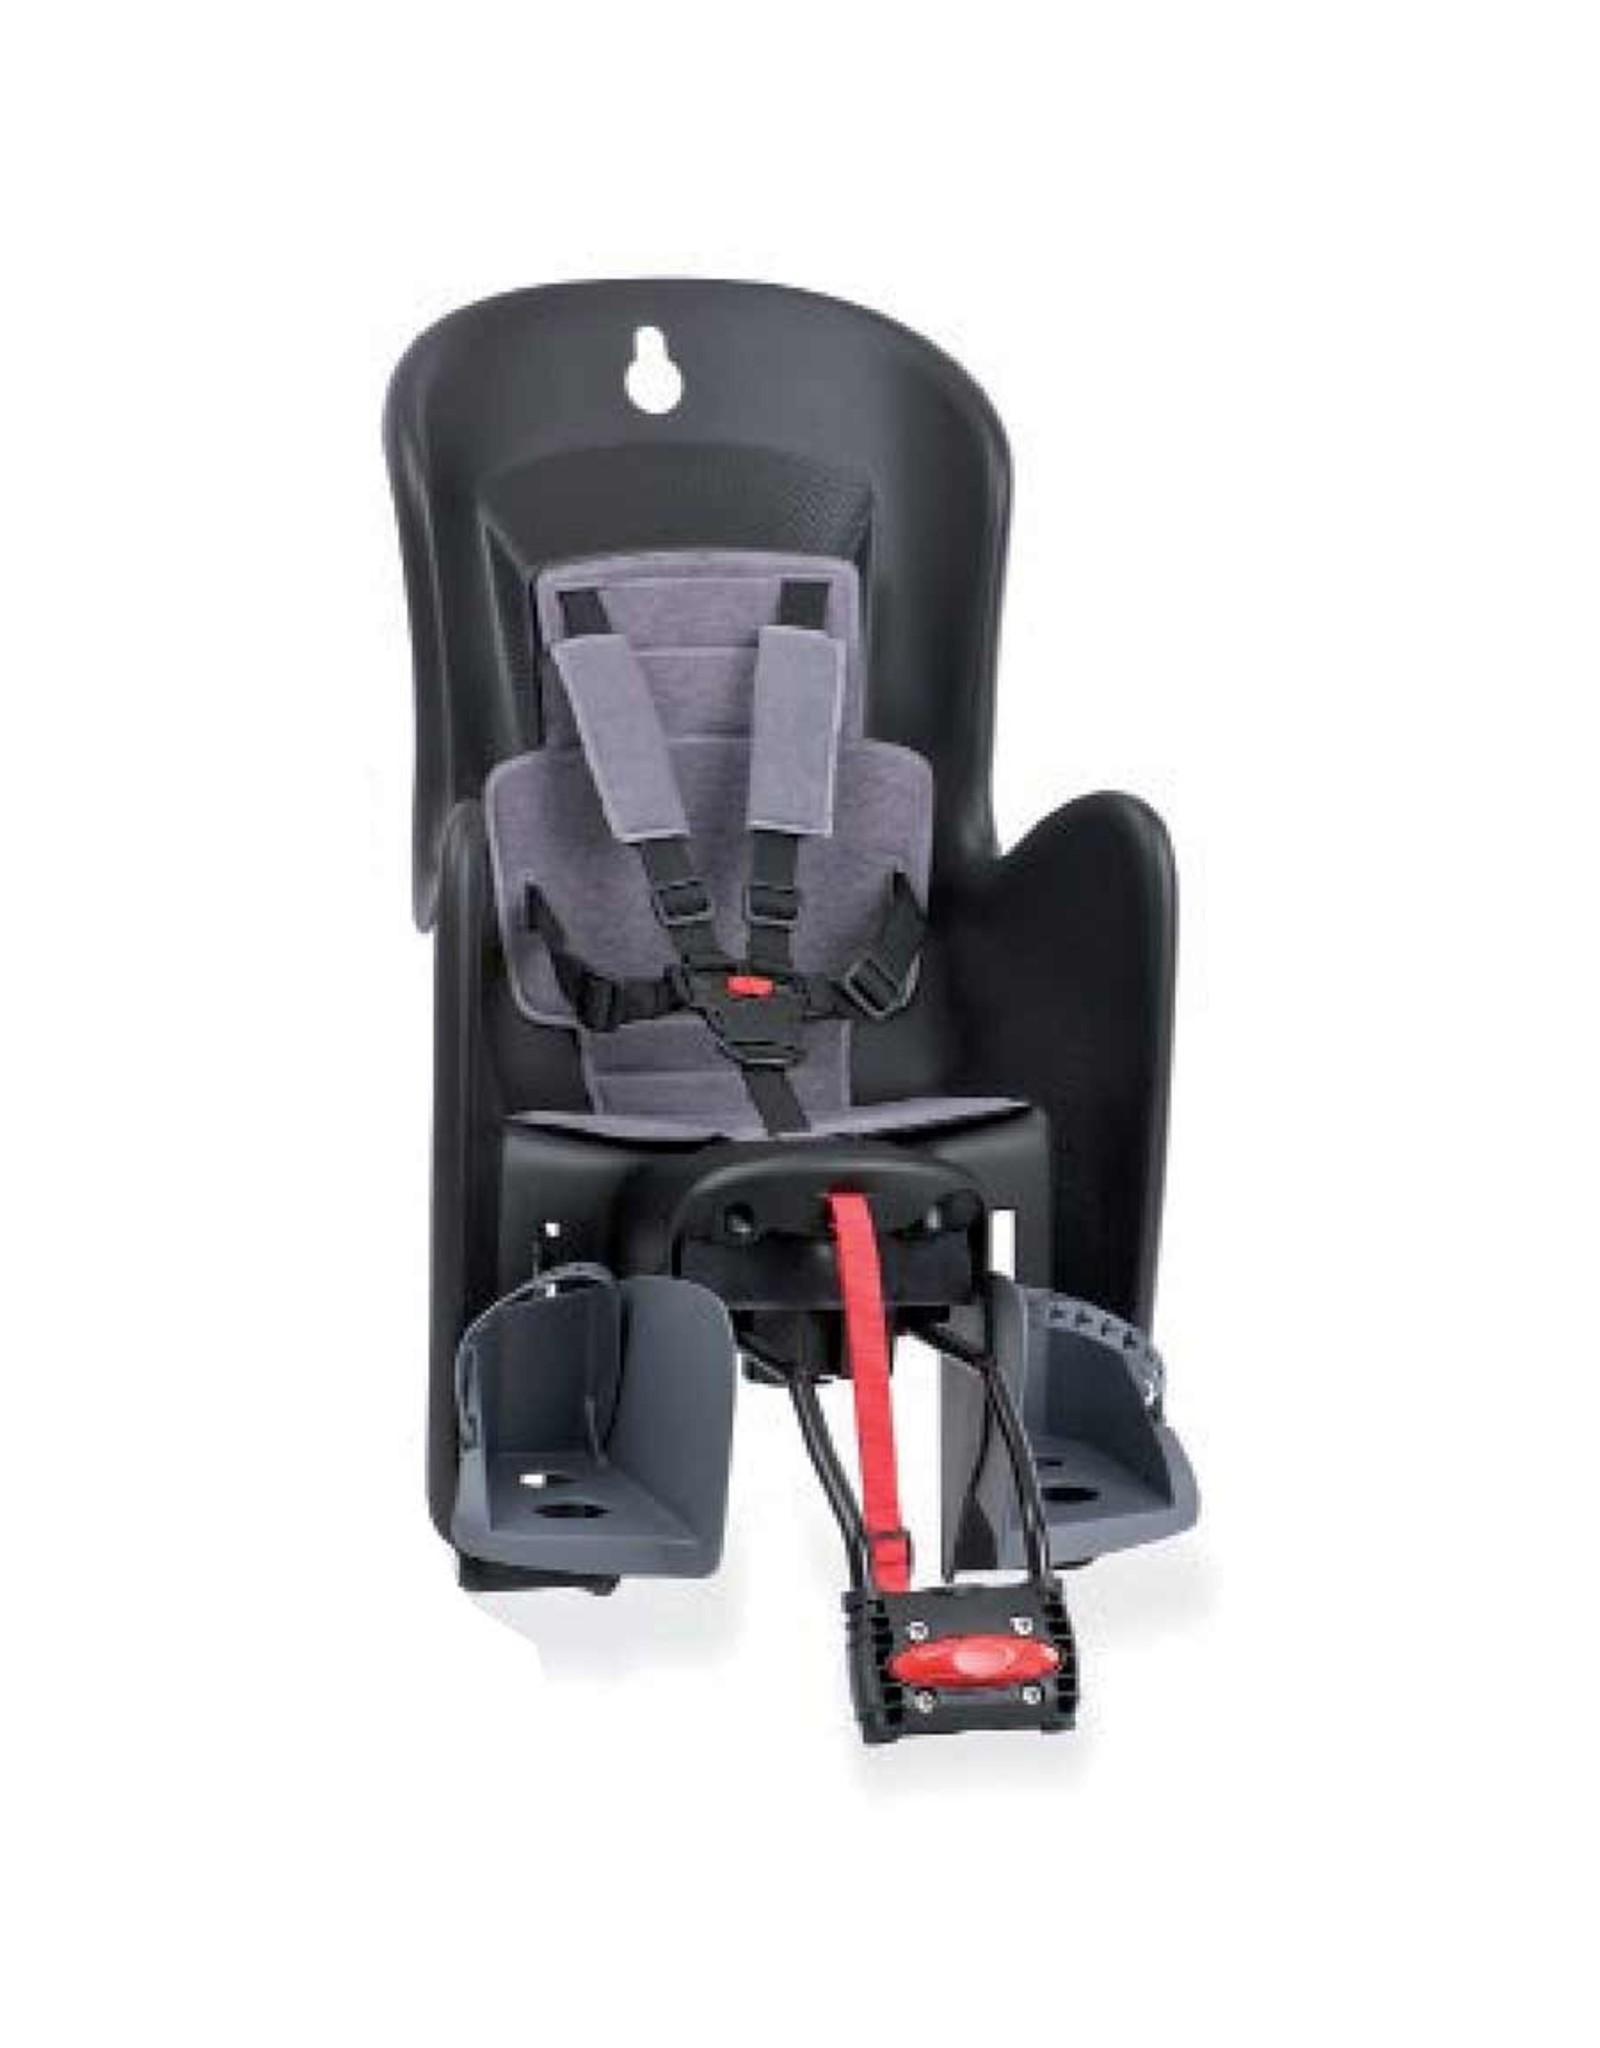 Polisport Polisport, Bilby RS, Baby seat, Black/Grey